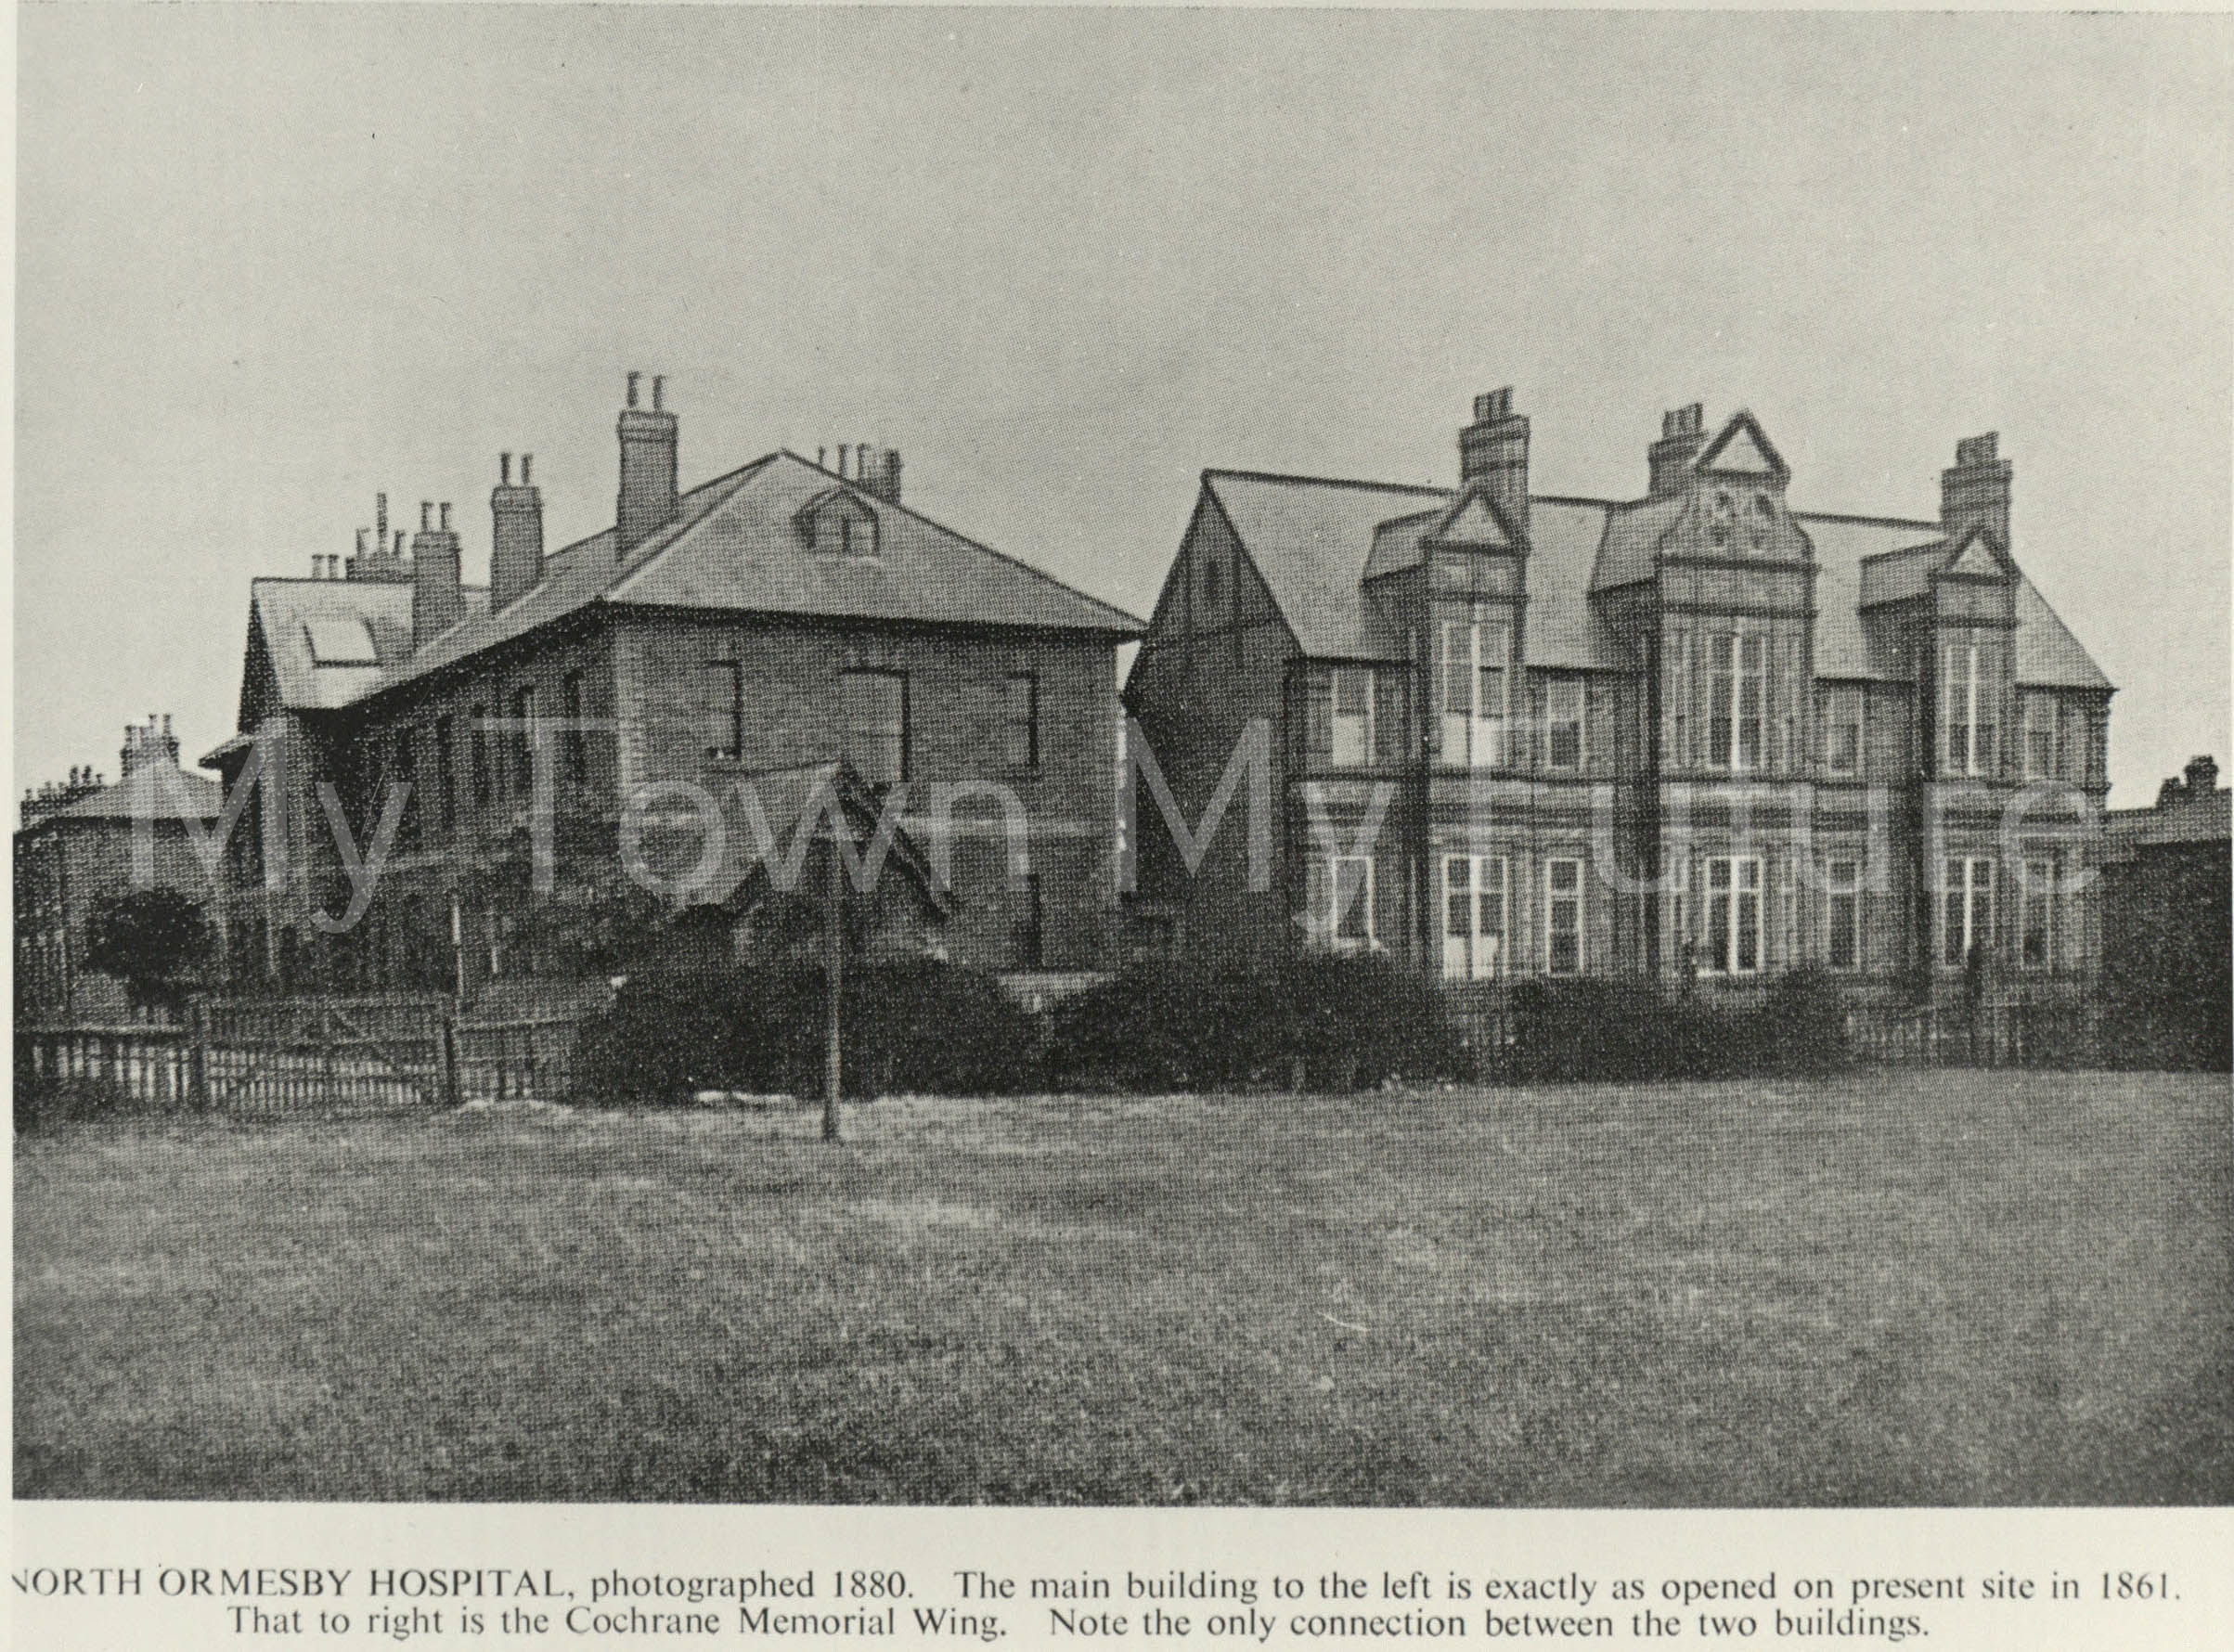 North Ormesby Cottage Hospital